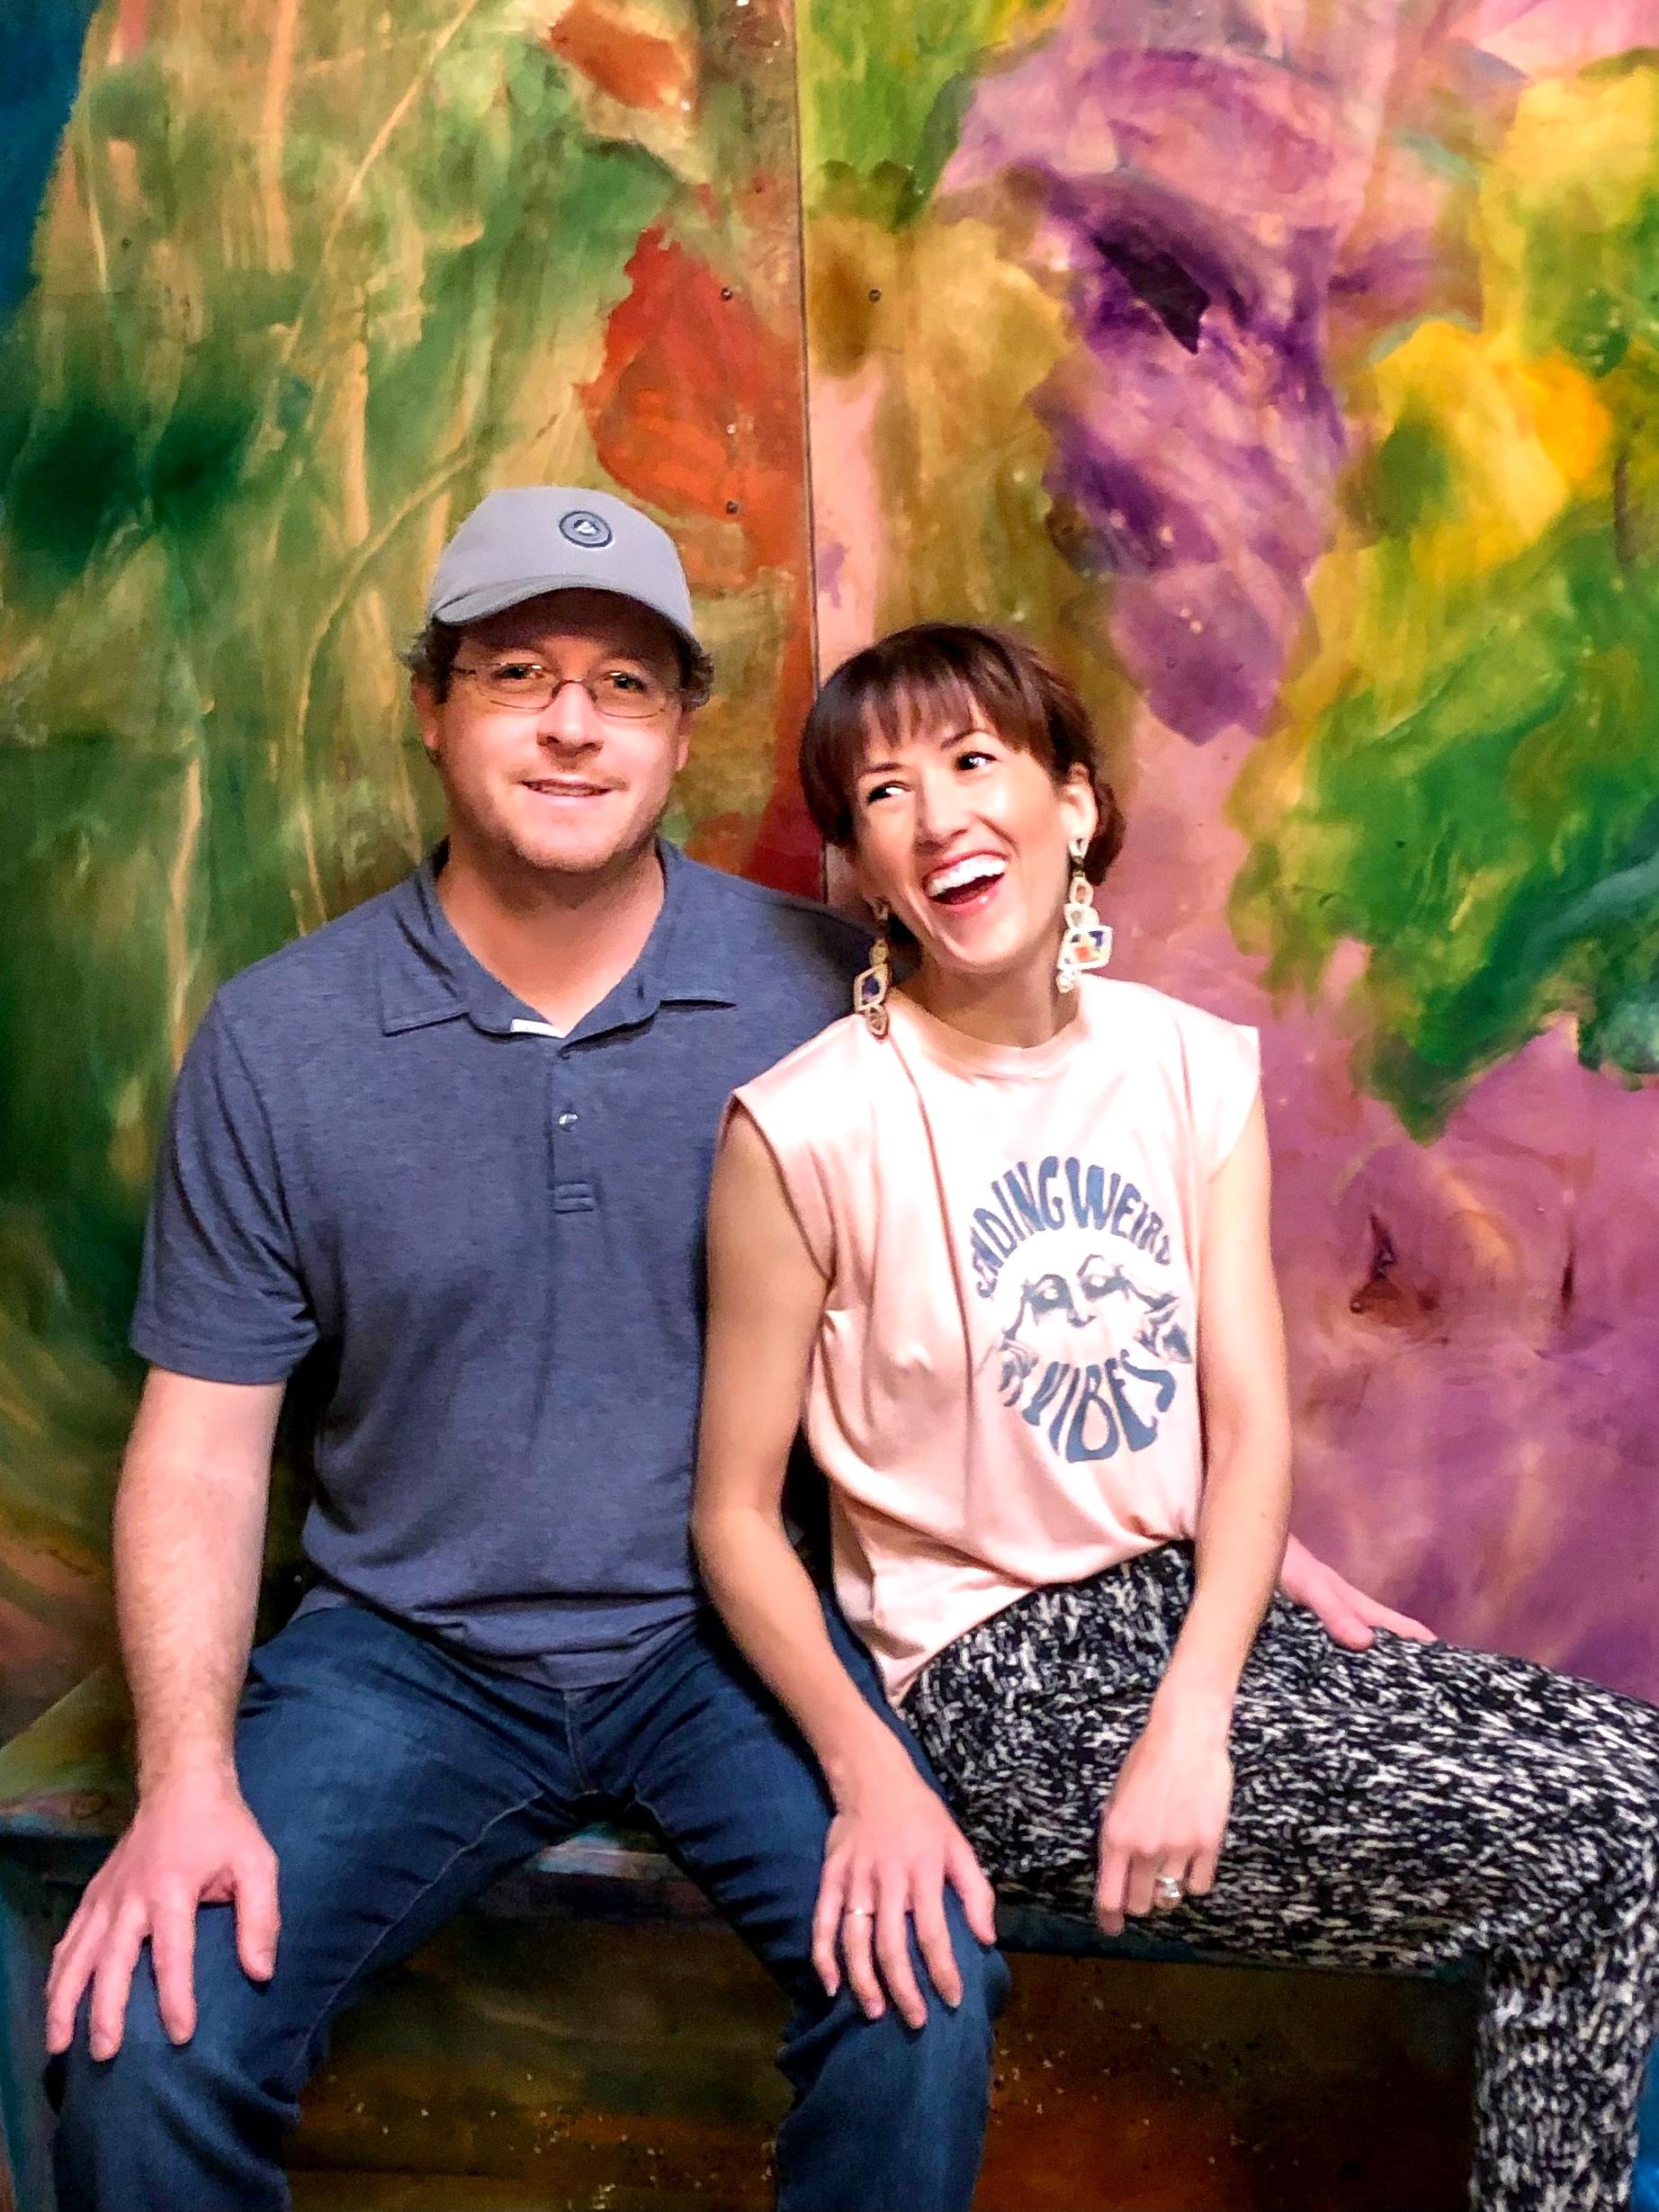 Alyssa Bird and her husband Nick Bahash enjoying art